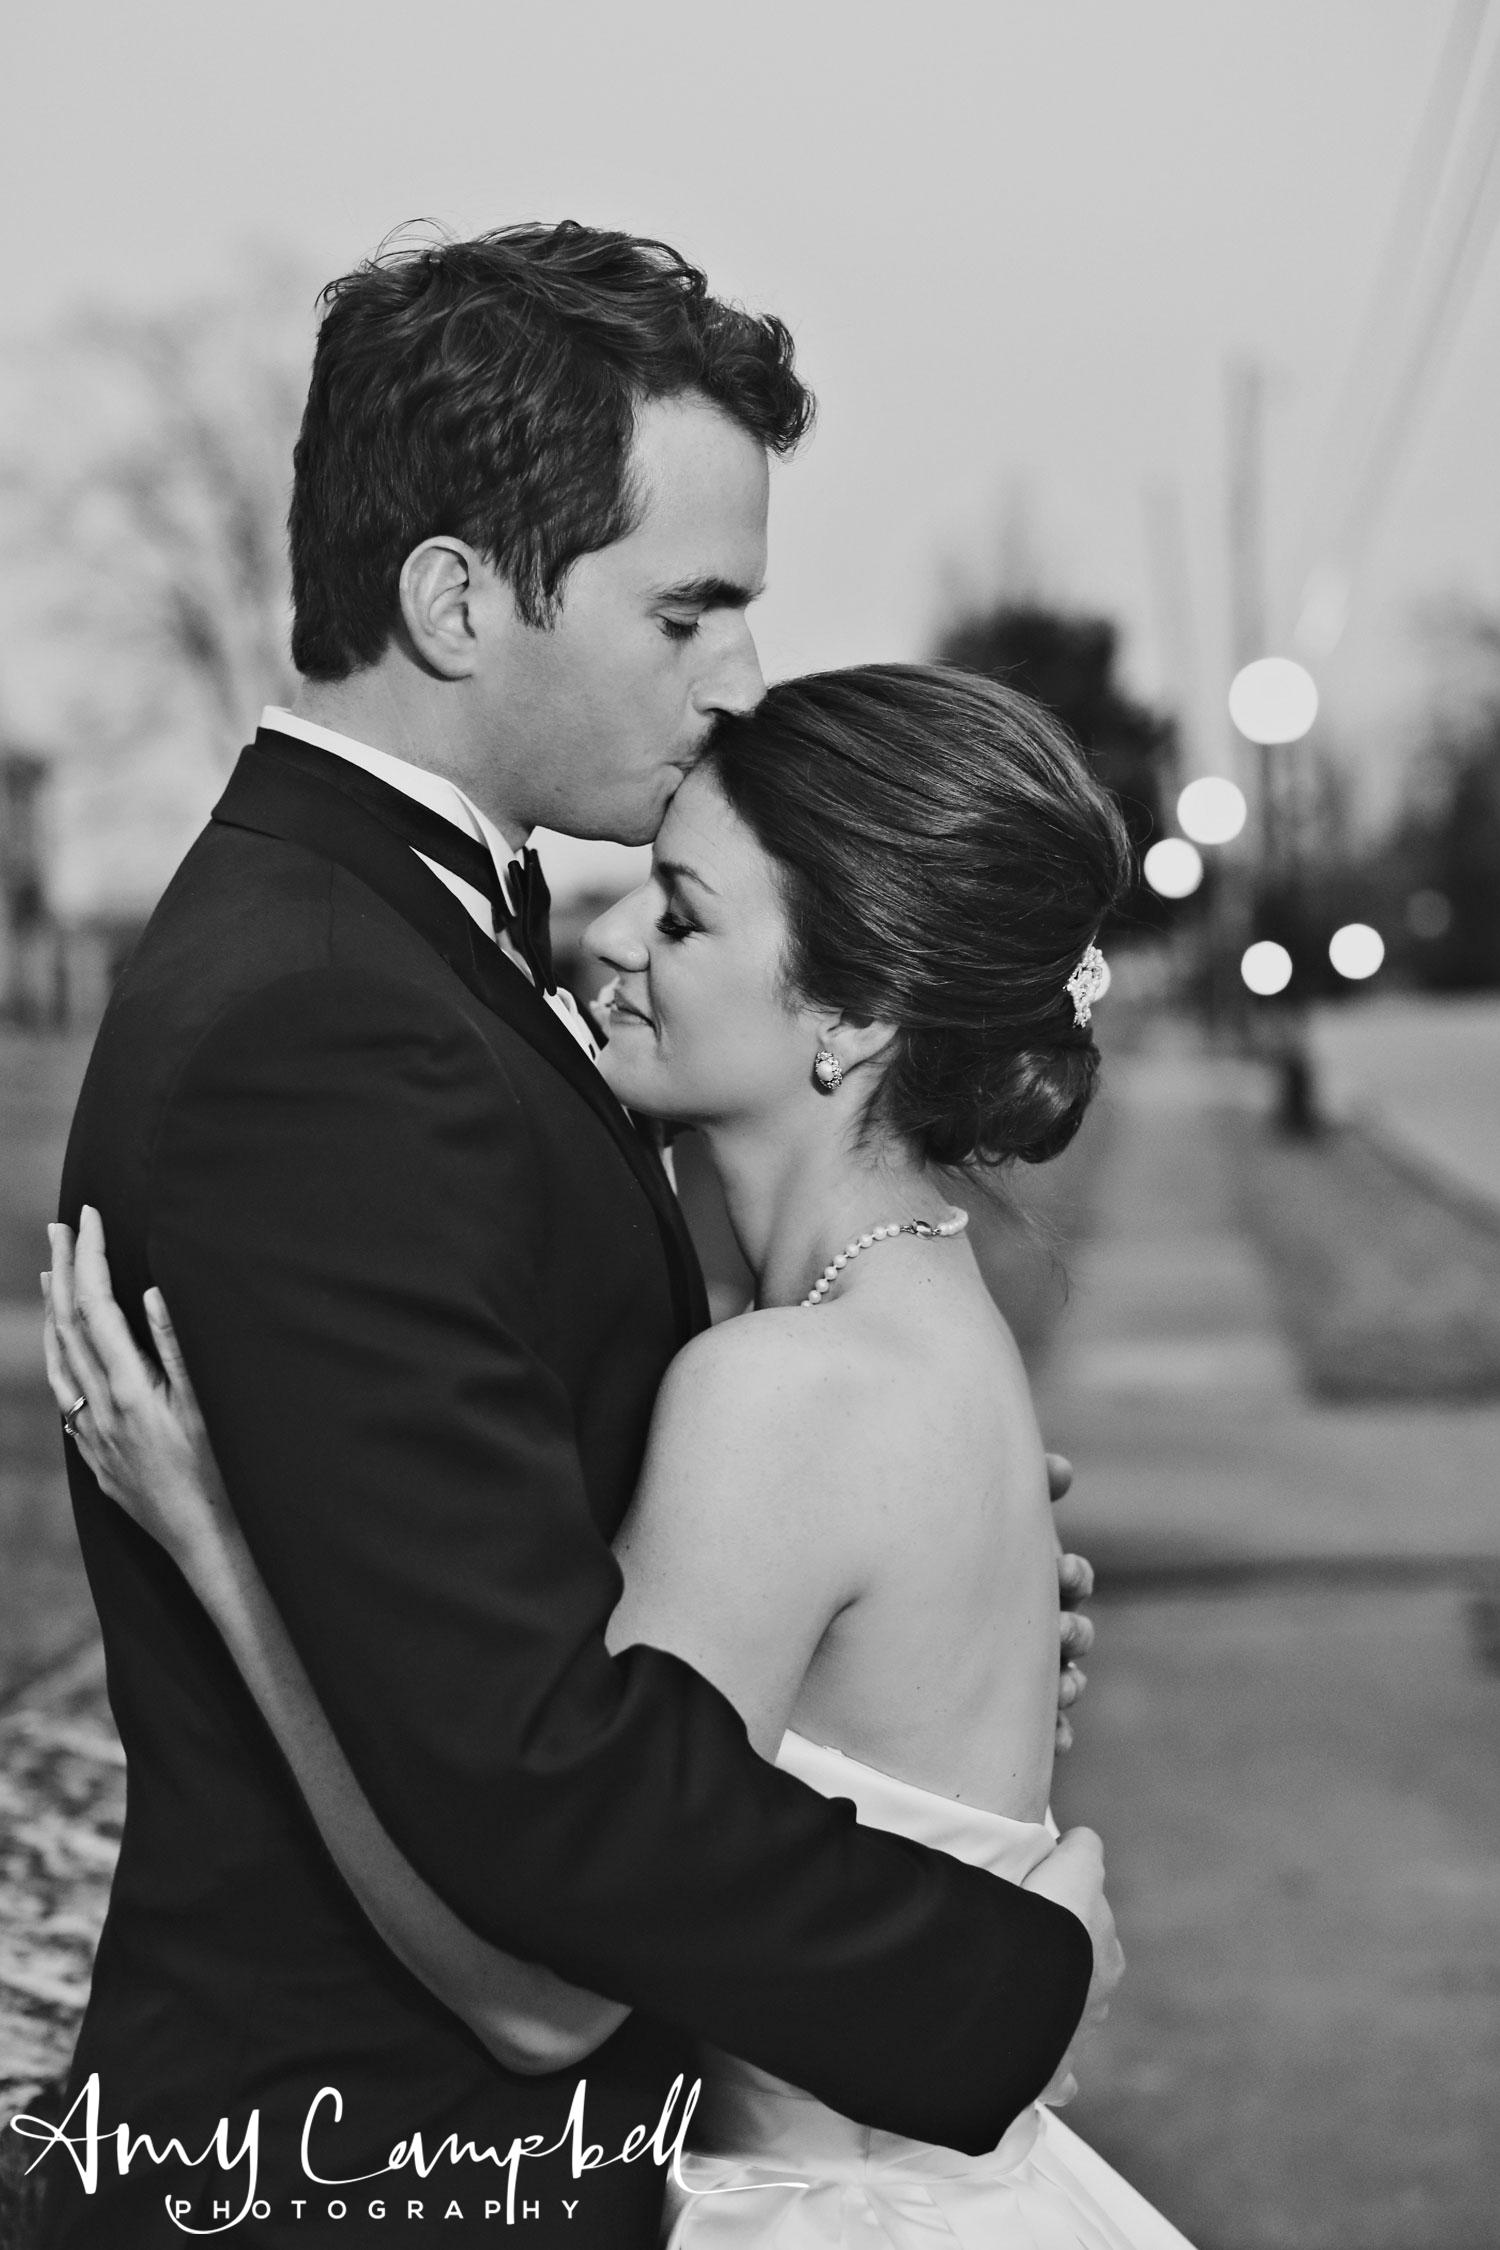 amyben_wed_winter_wedding_amycampbellphotography_01.jpg